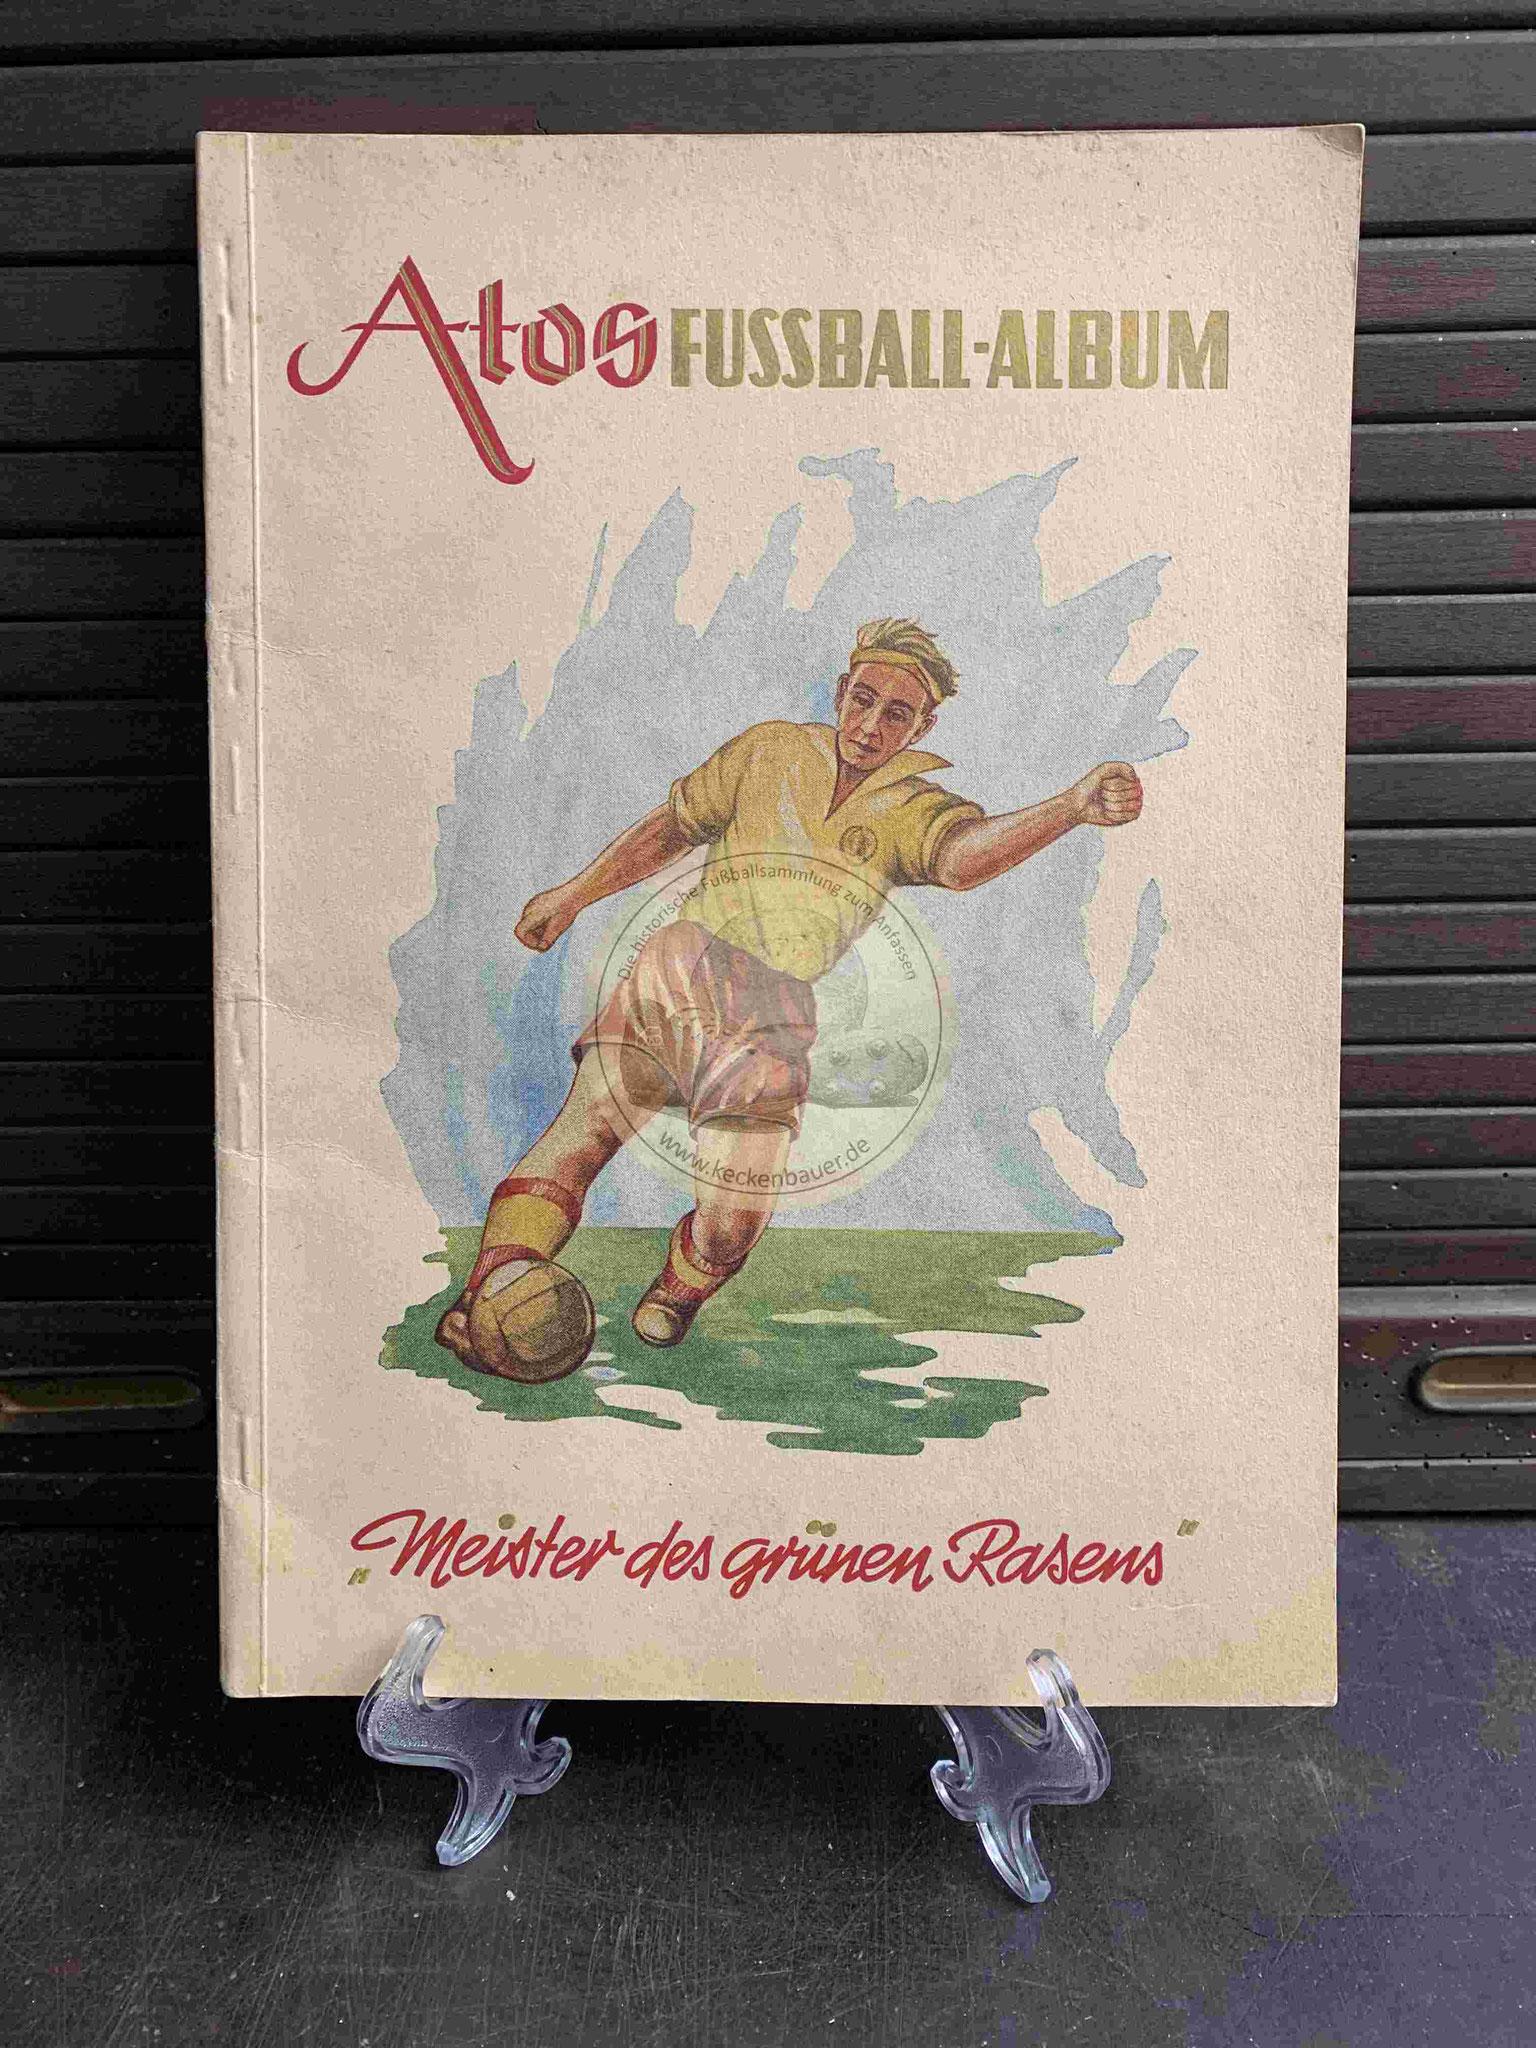 1952 ATOS Fussball-Album Meidter des grünen Rasens